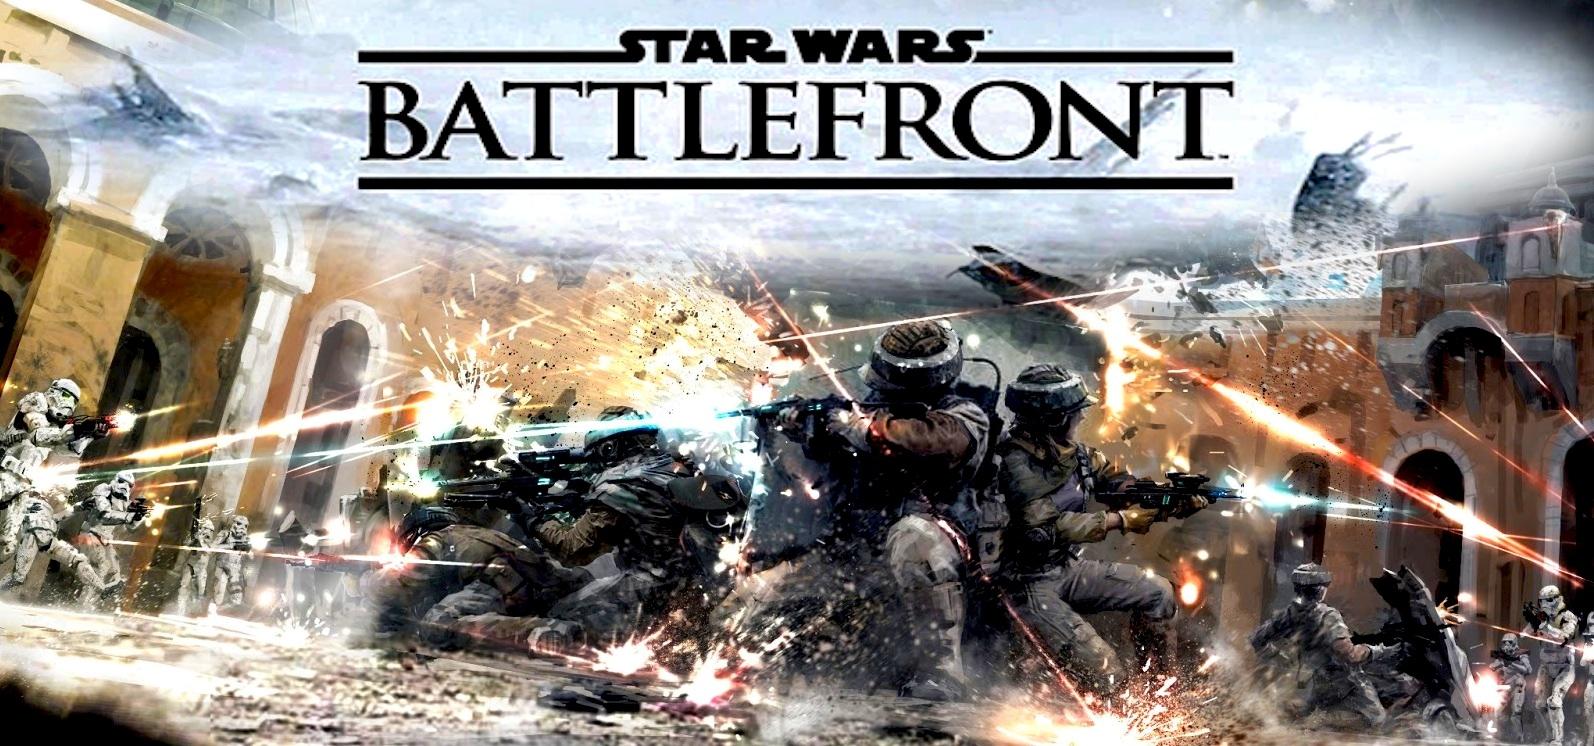 49 Star Wars Battlefront Hd Wallpaper On Wallpapersafari